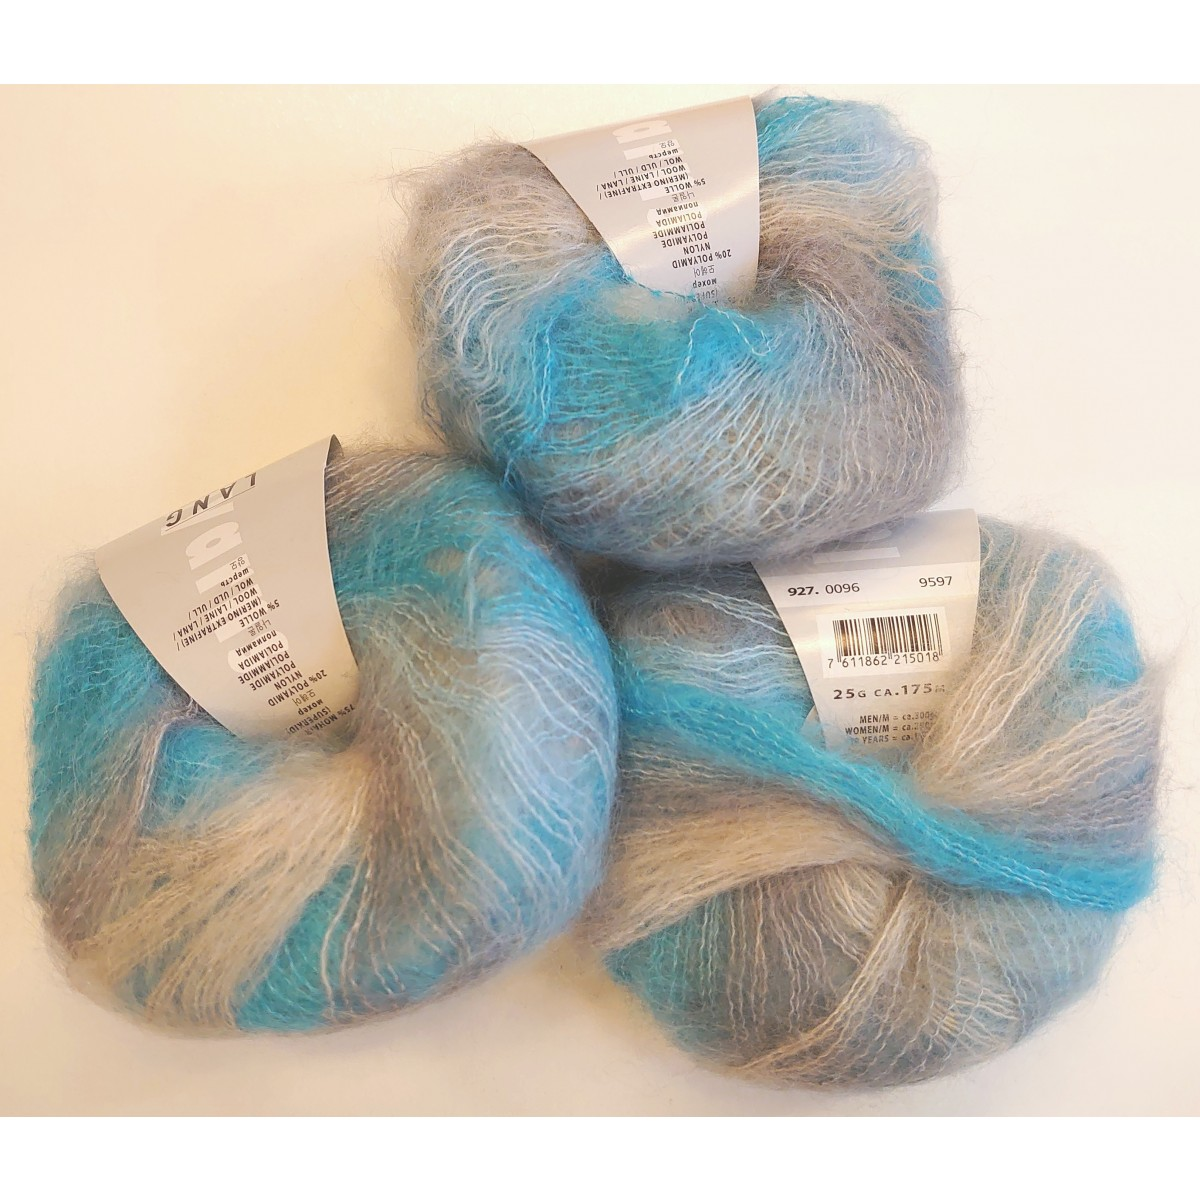 blå/grå, 9 stk